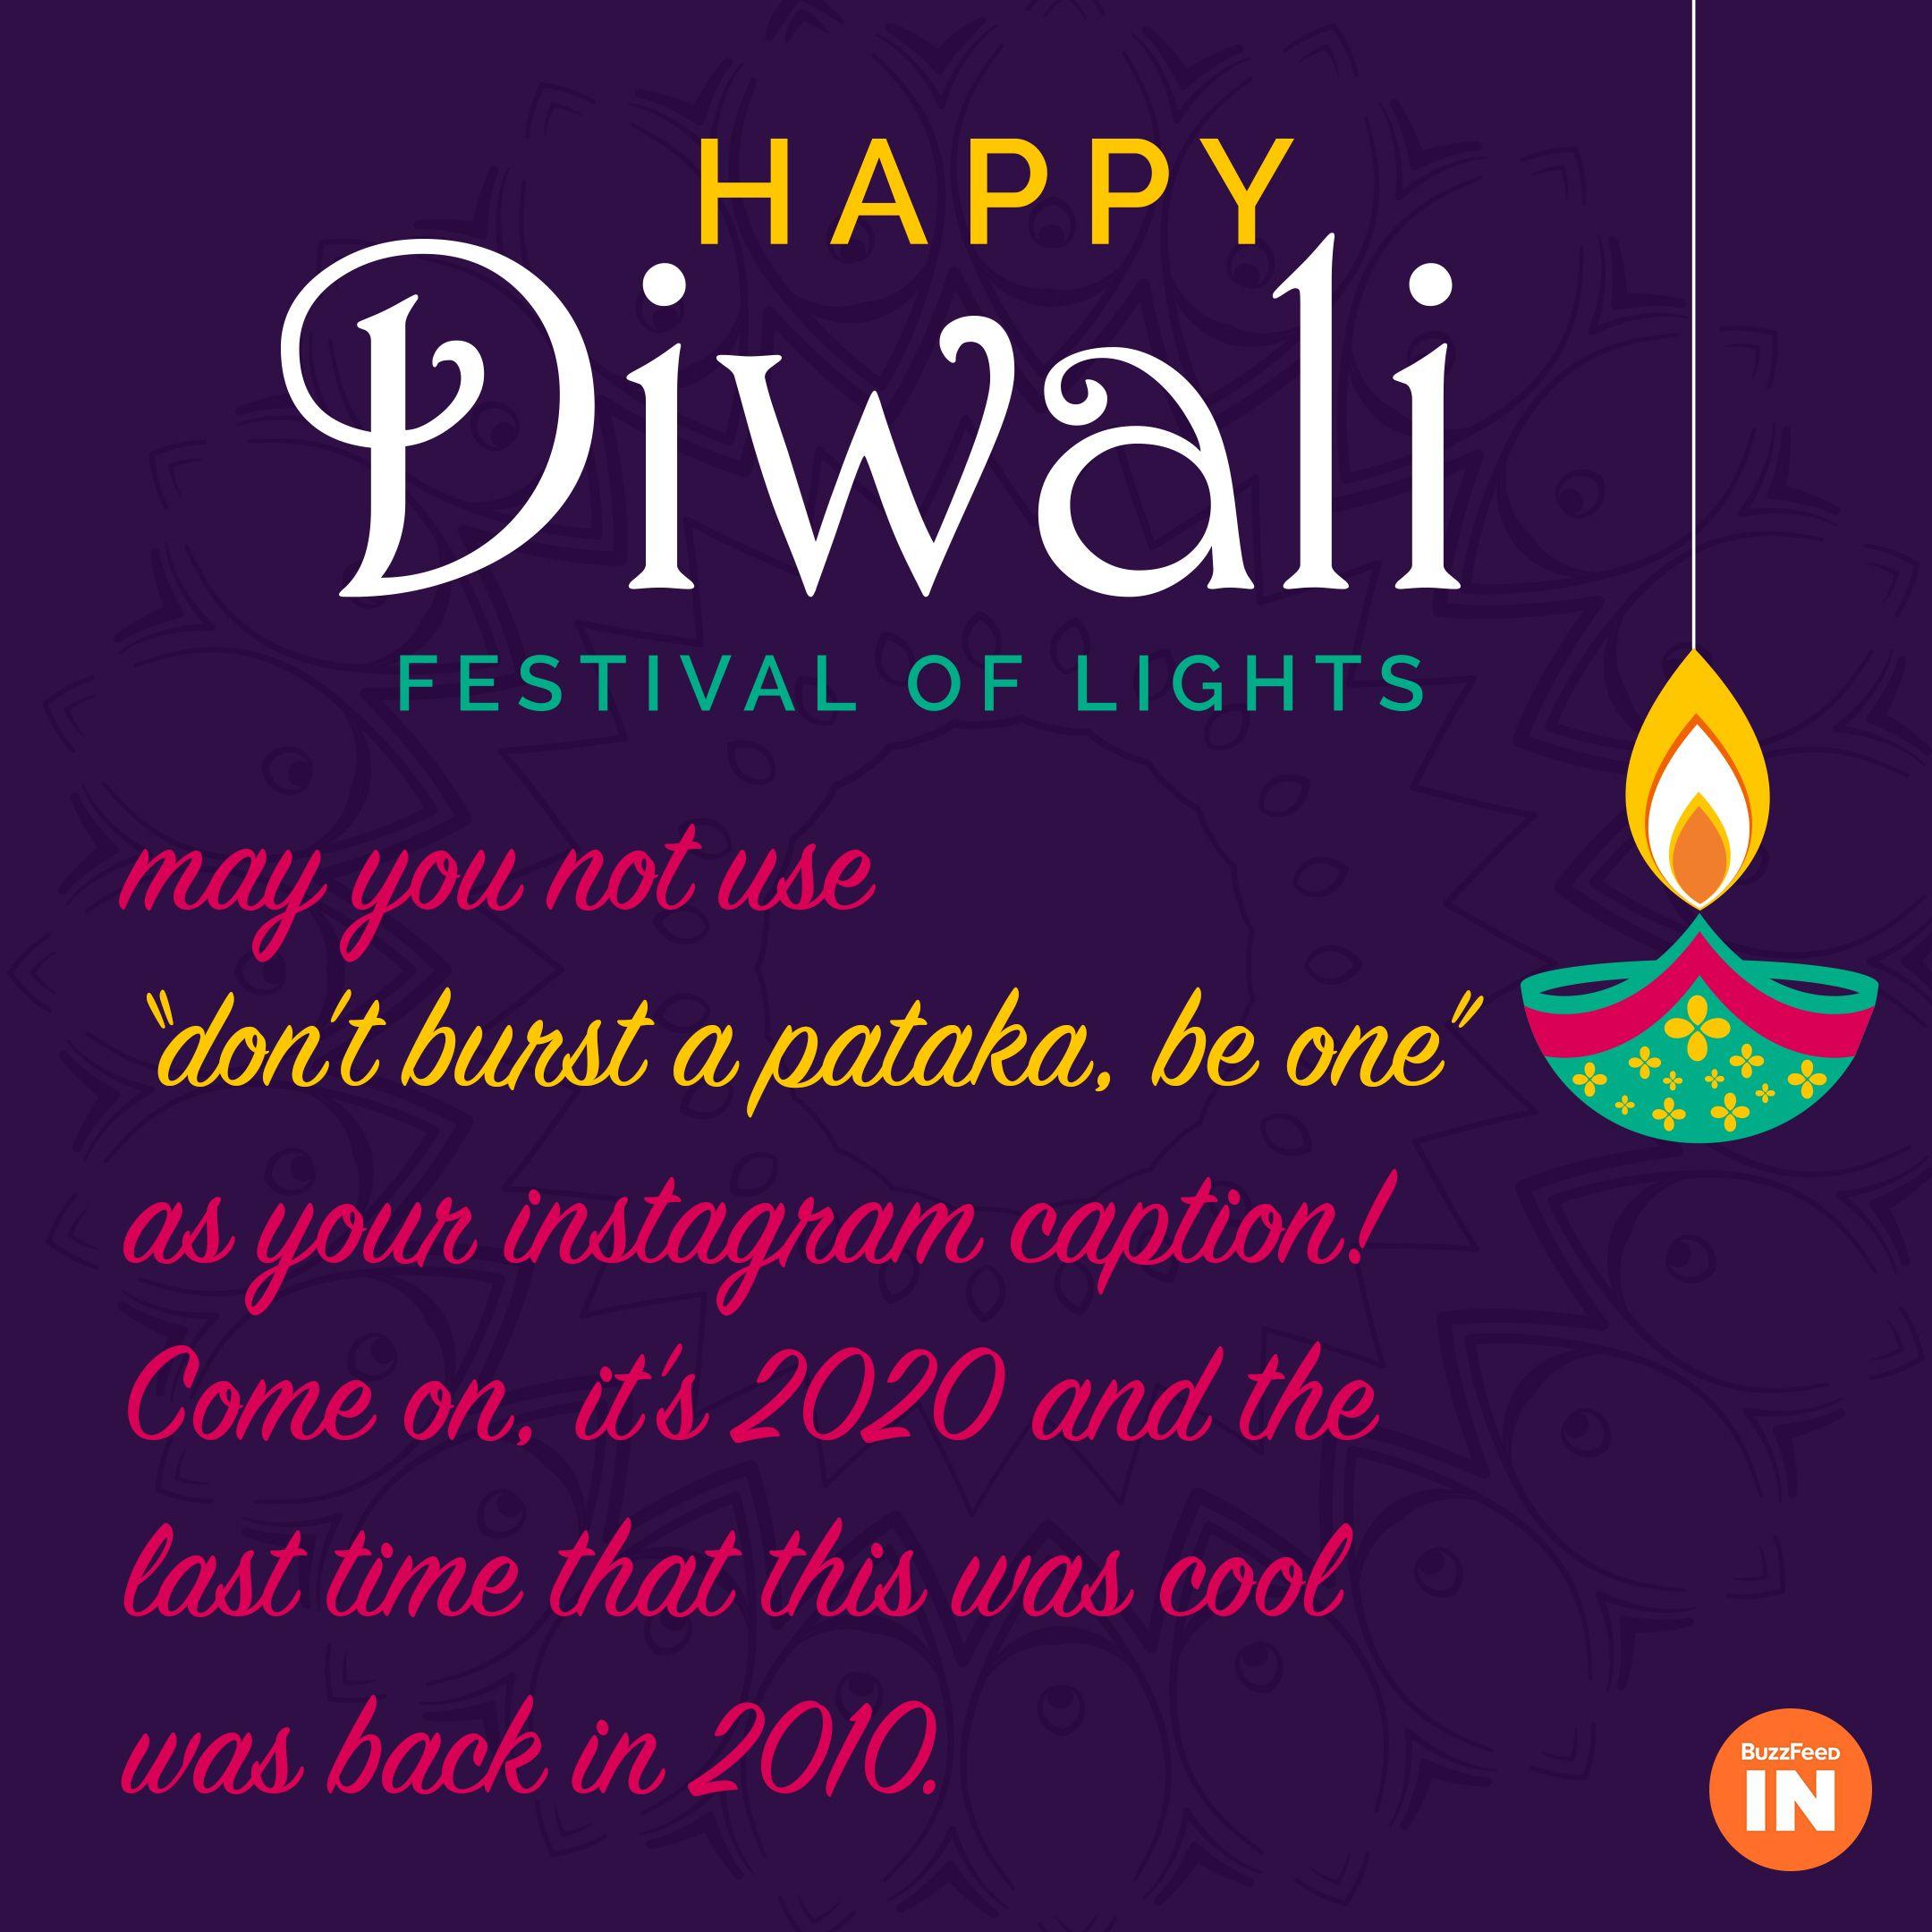 Funny Diwali Greeting Card Buzzfeed India Diwali Greeting Cards Diwali Greetings Funny Greeting Cards